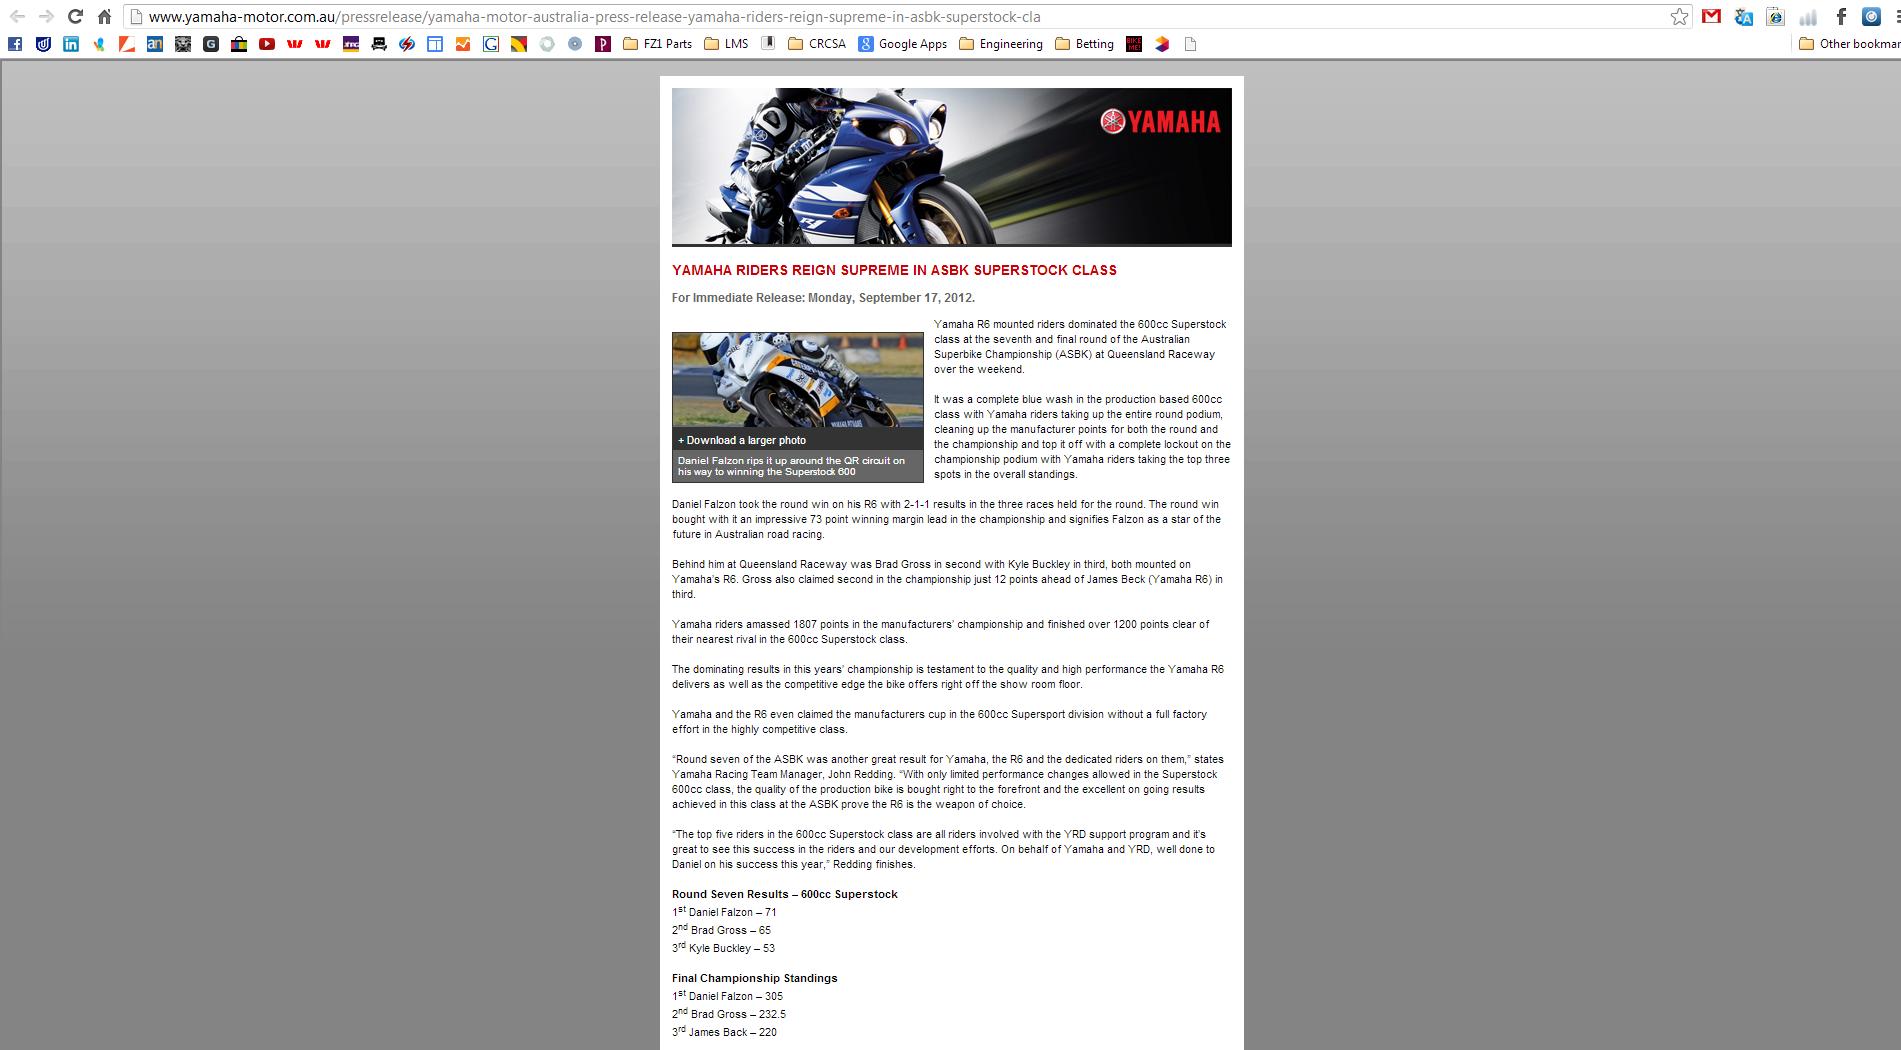 2012-09-17 Yamaha Motor Australia